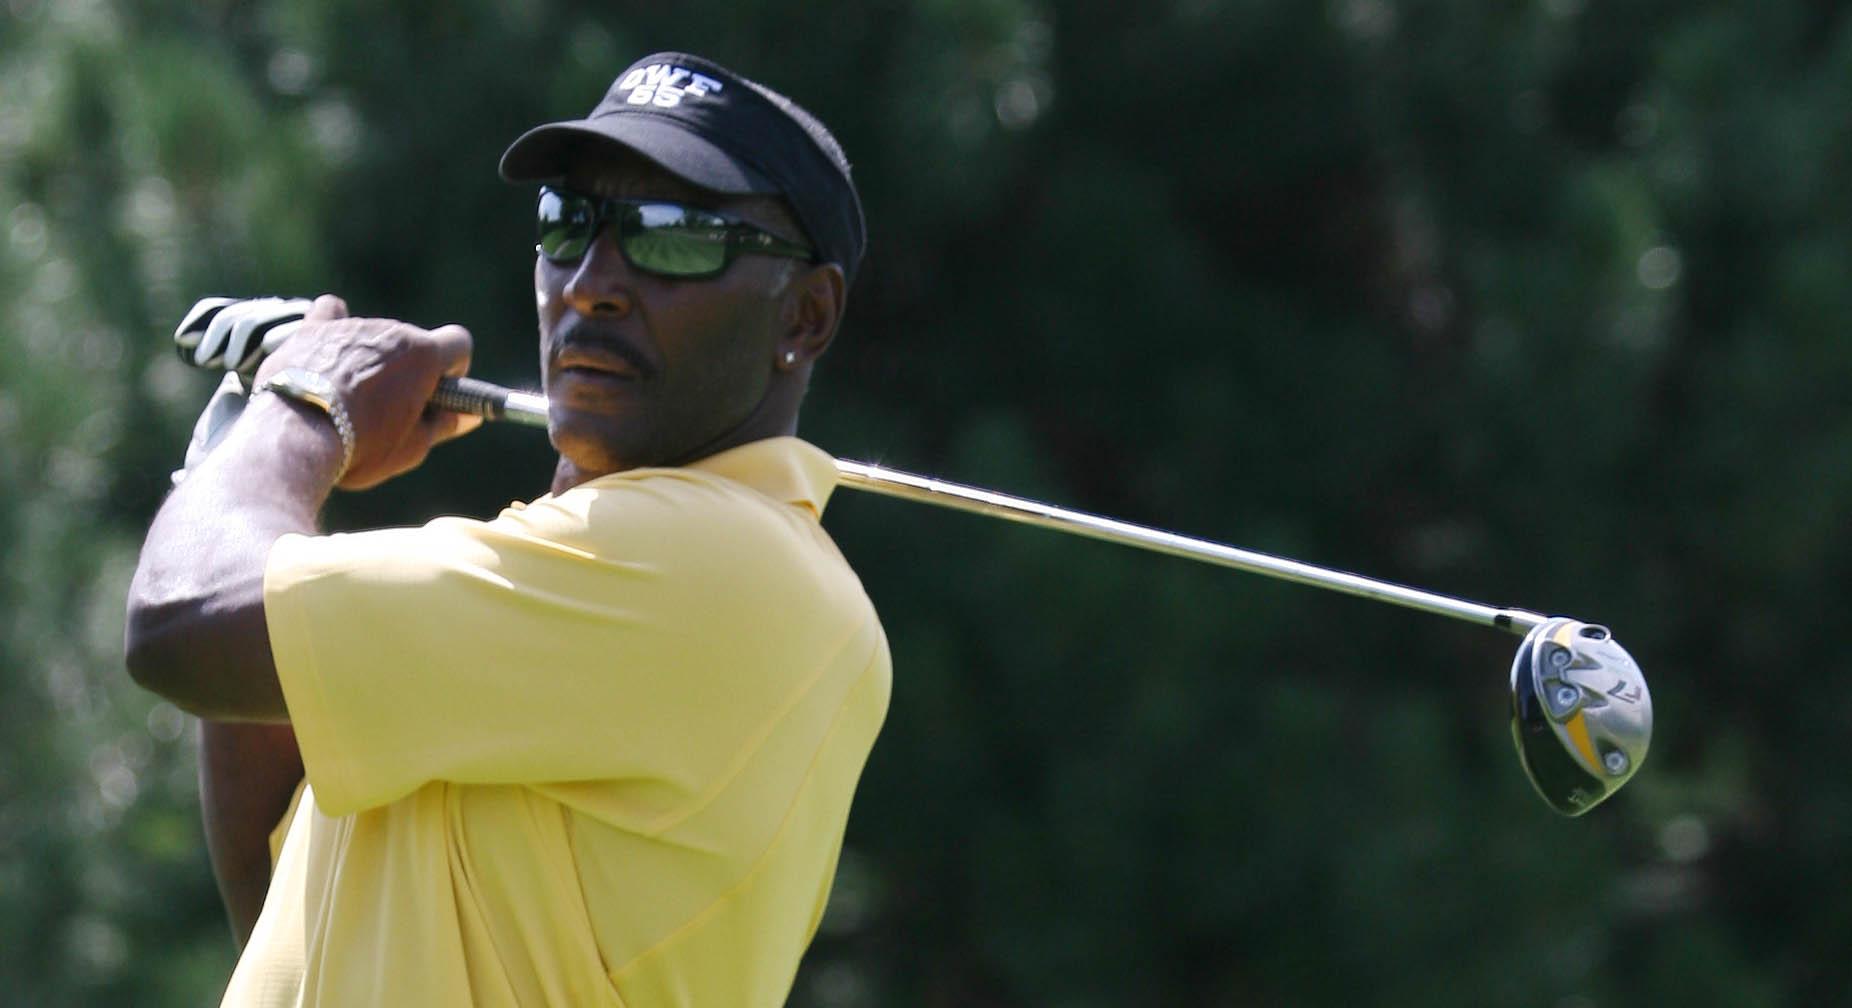 Chicago Urban League Hosts Projectnext Golf Classic